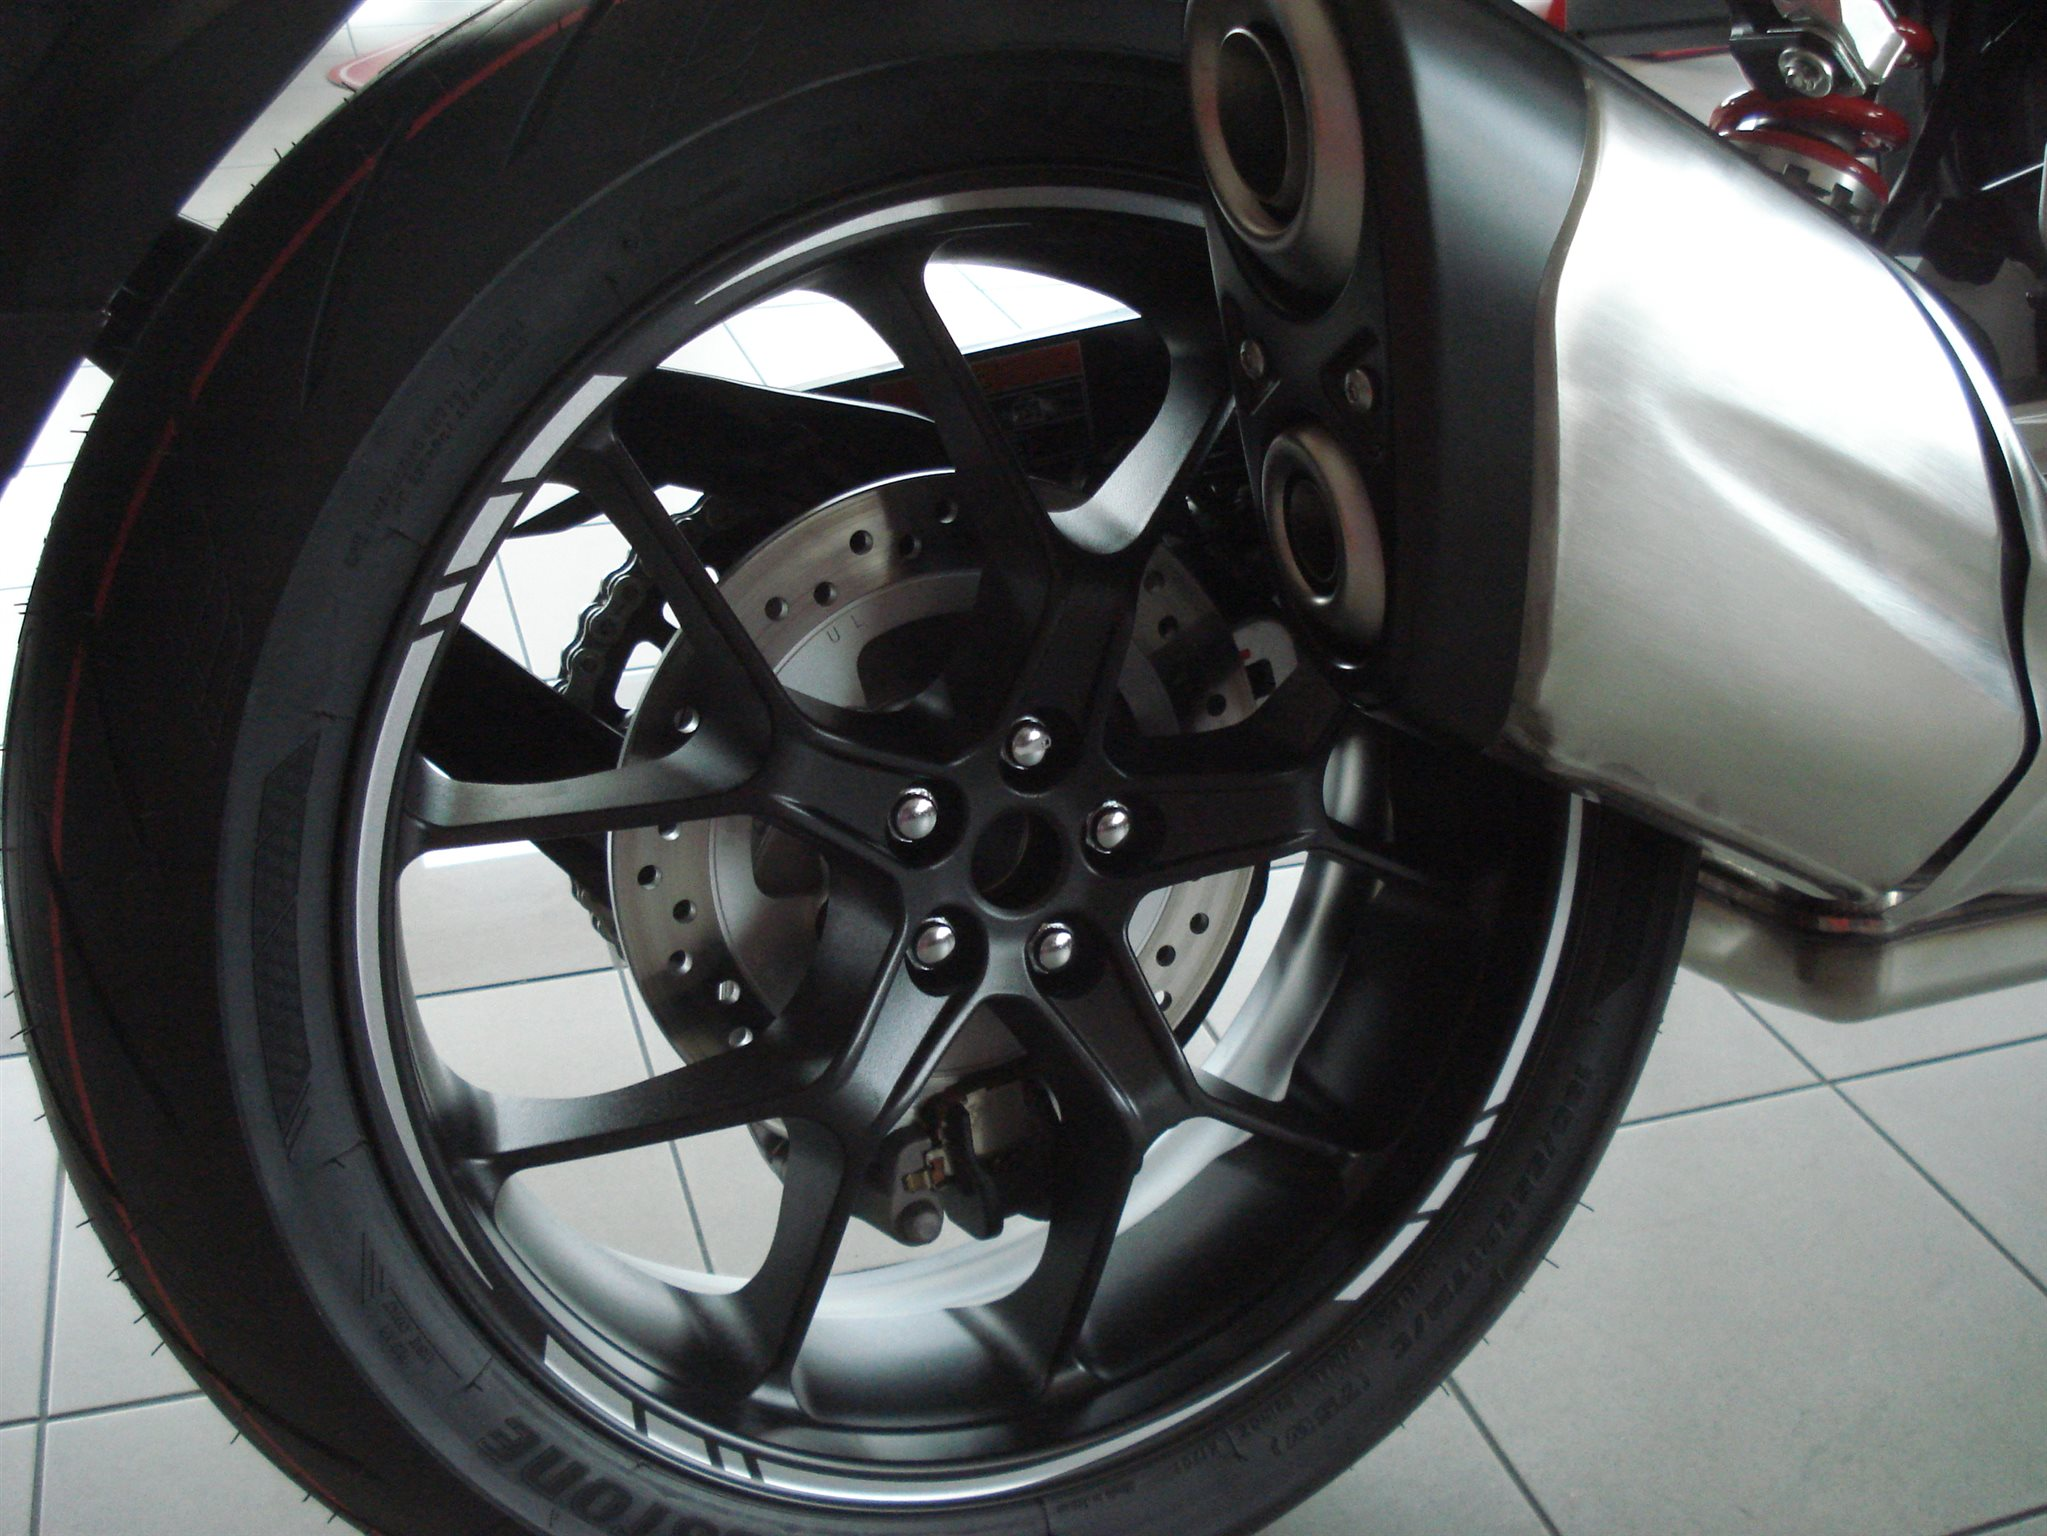 umgebautes motorrad honda cb 1000 r von motoklora gmbh. Black Bedroom Furniture Sets. Home Design Ideas